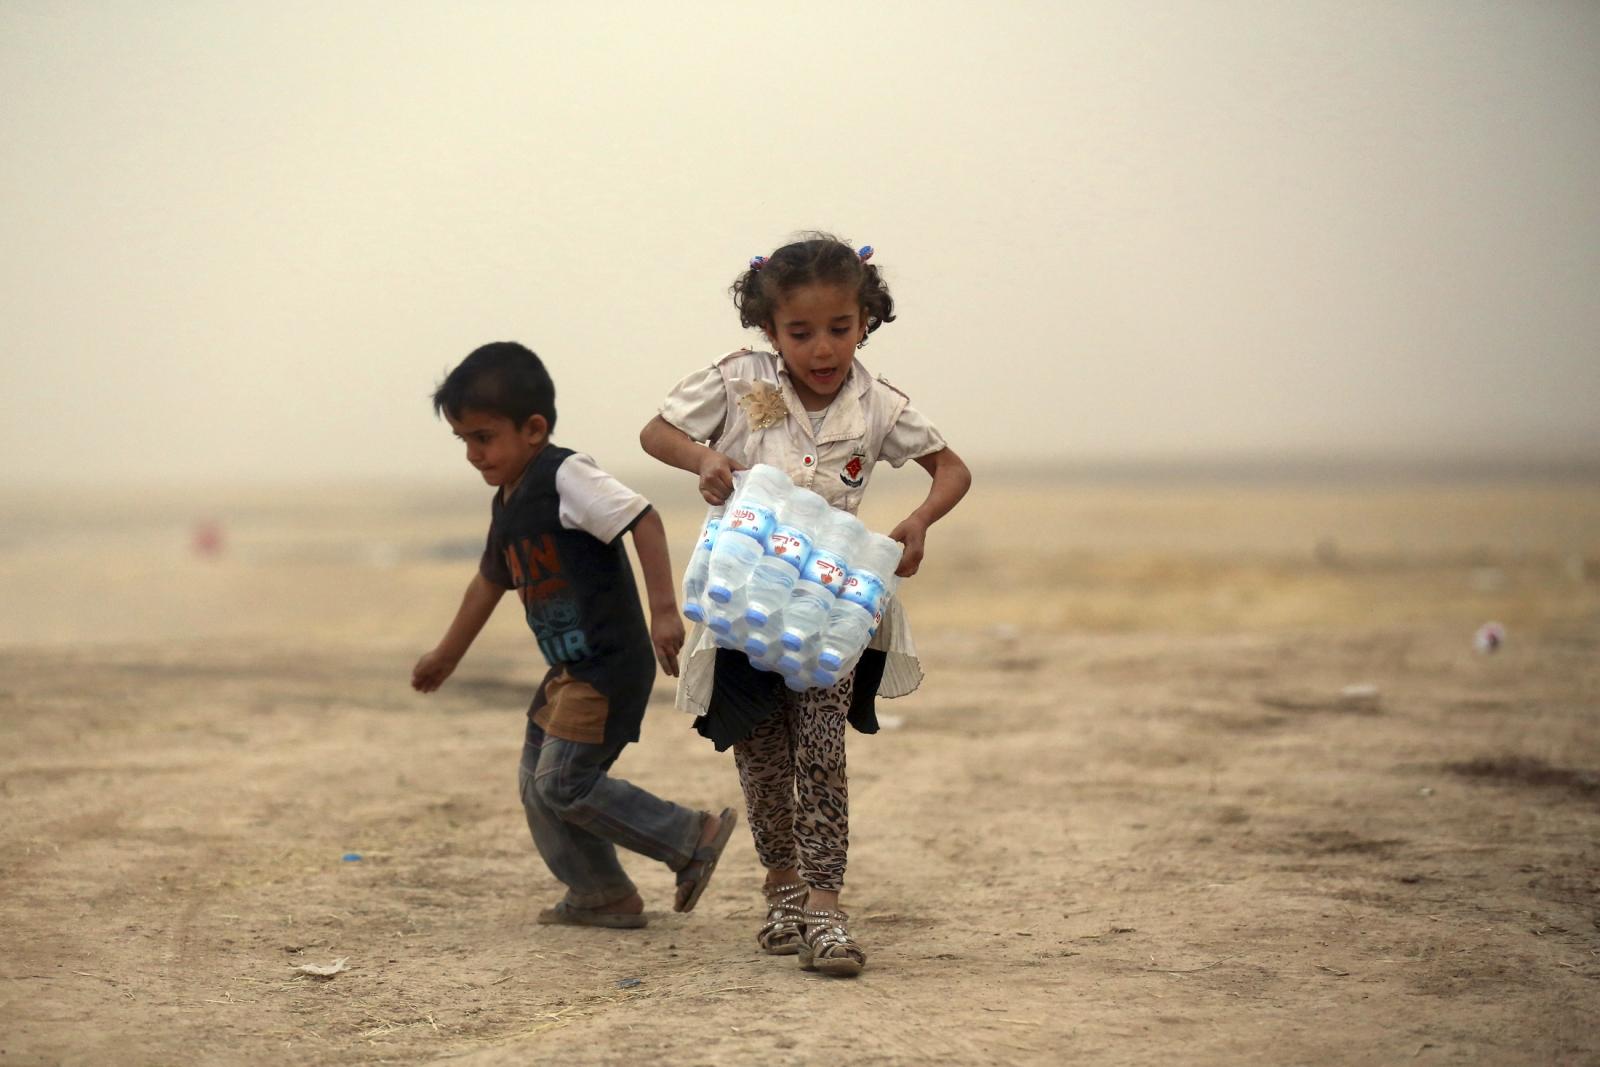 Iraq crisis: Isis kidnaps children